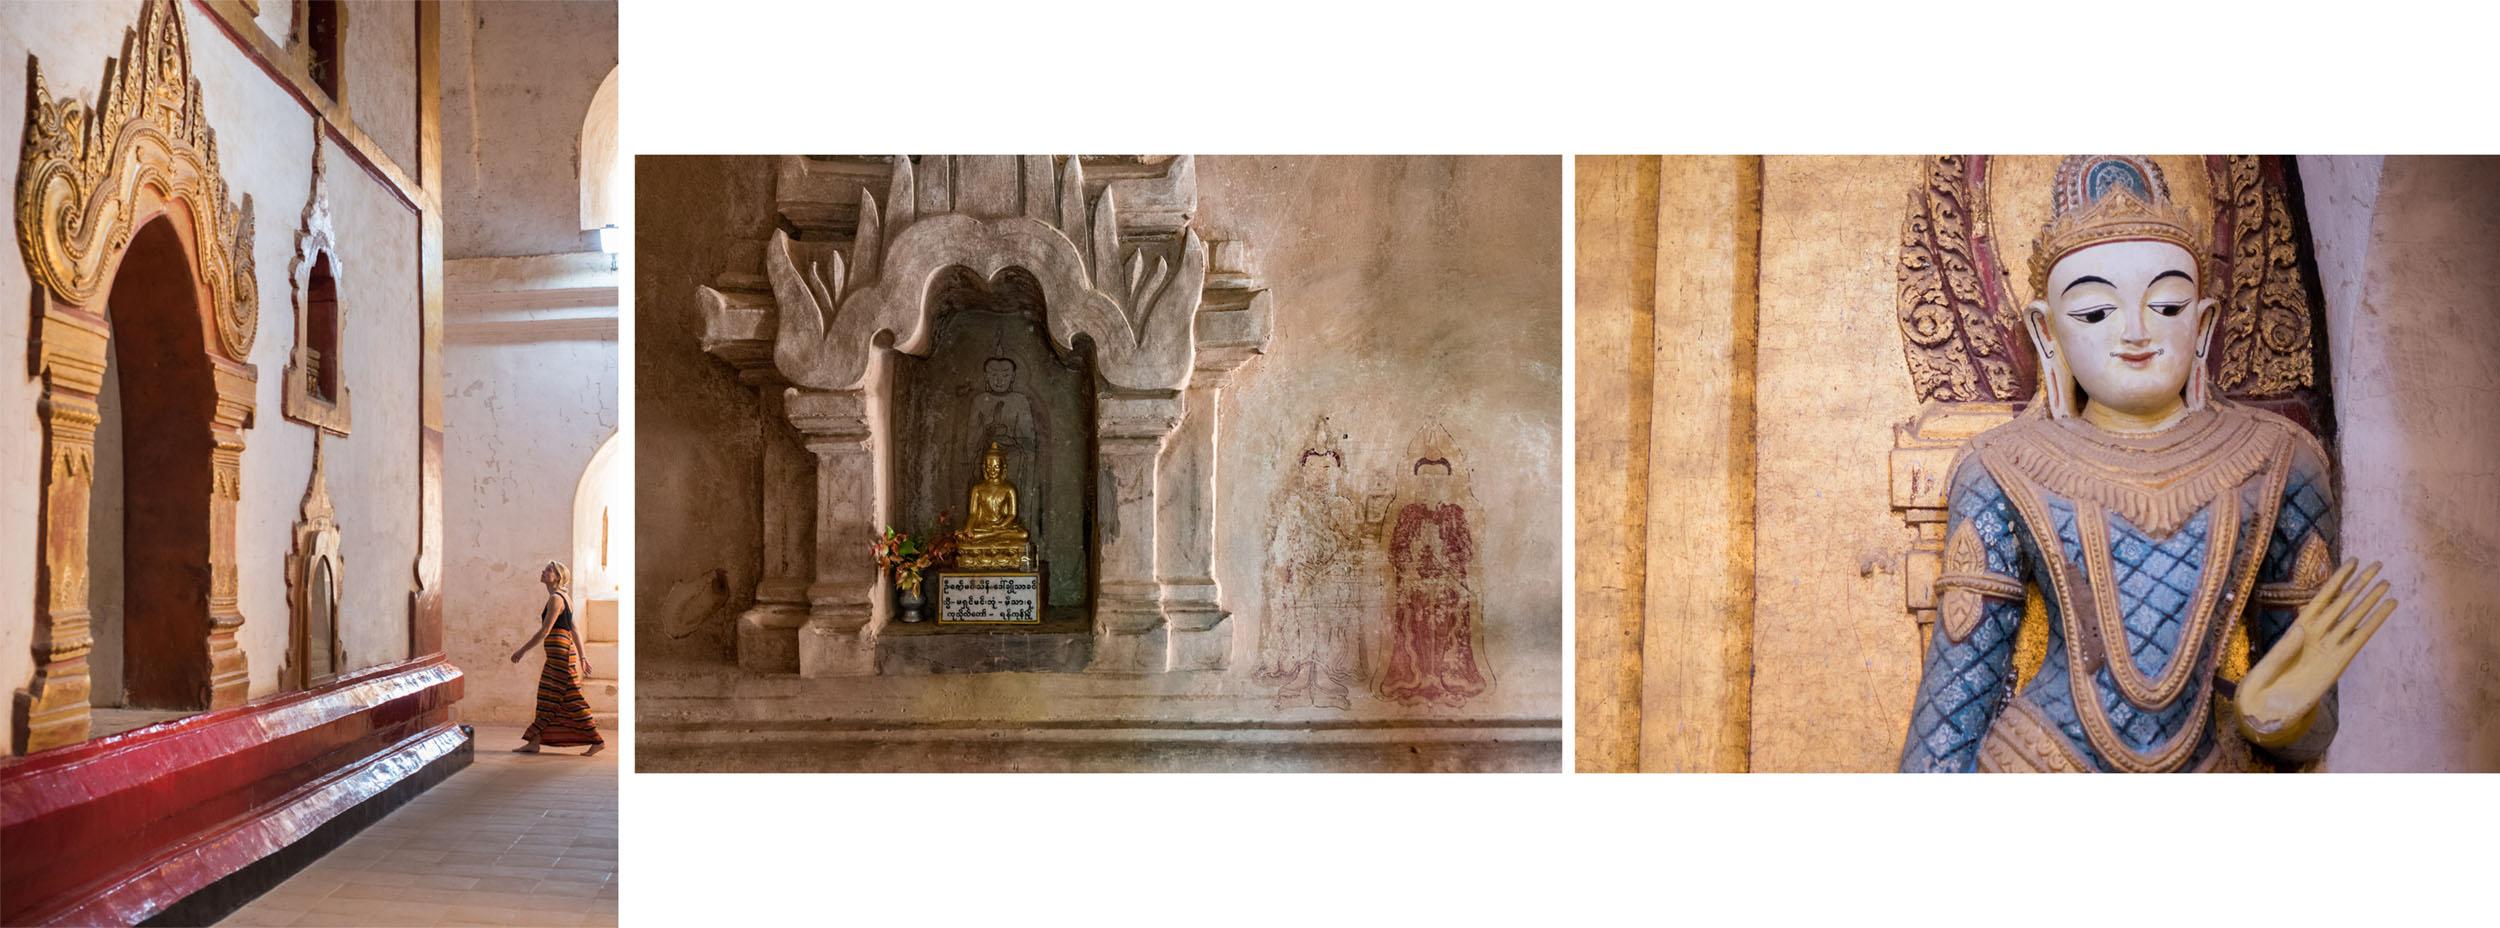 Drieluik in tempels in Myanmar, Bagan